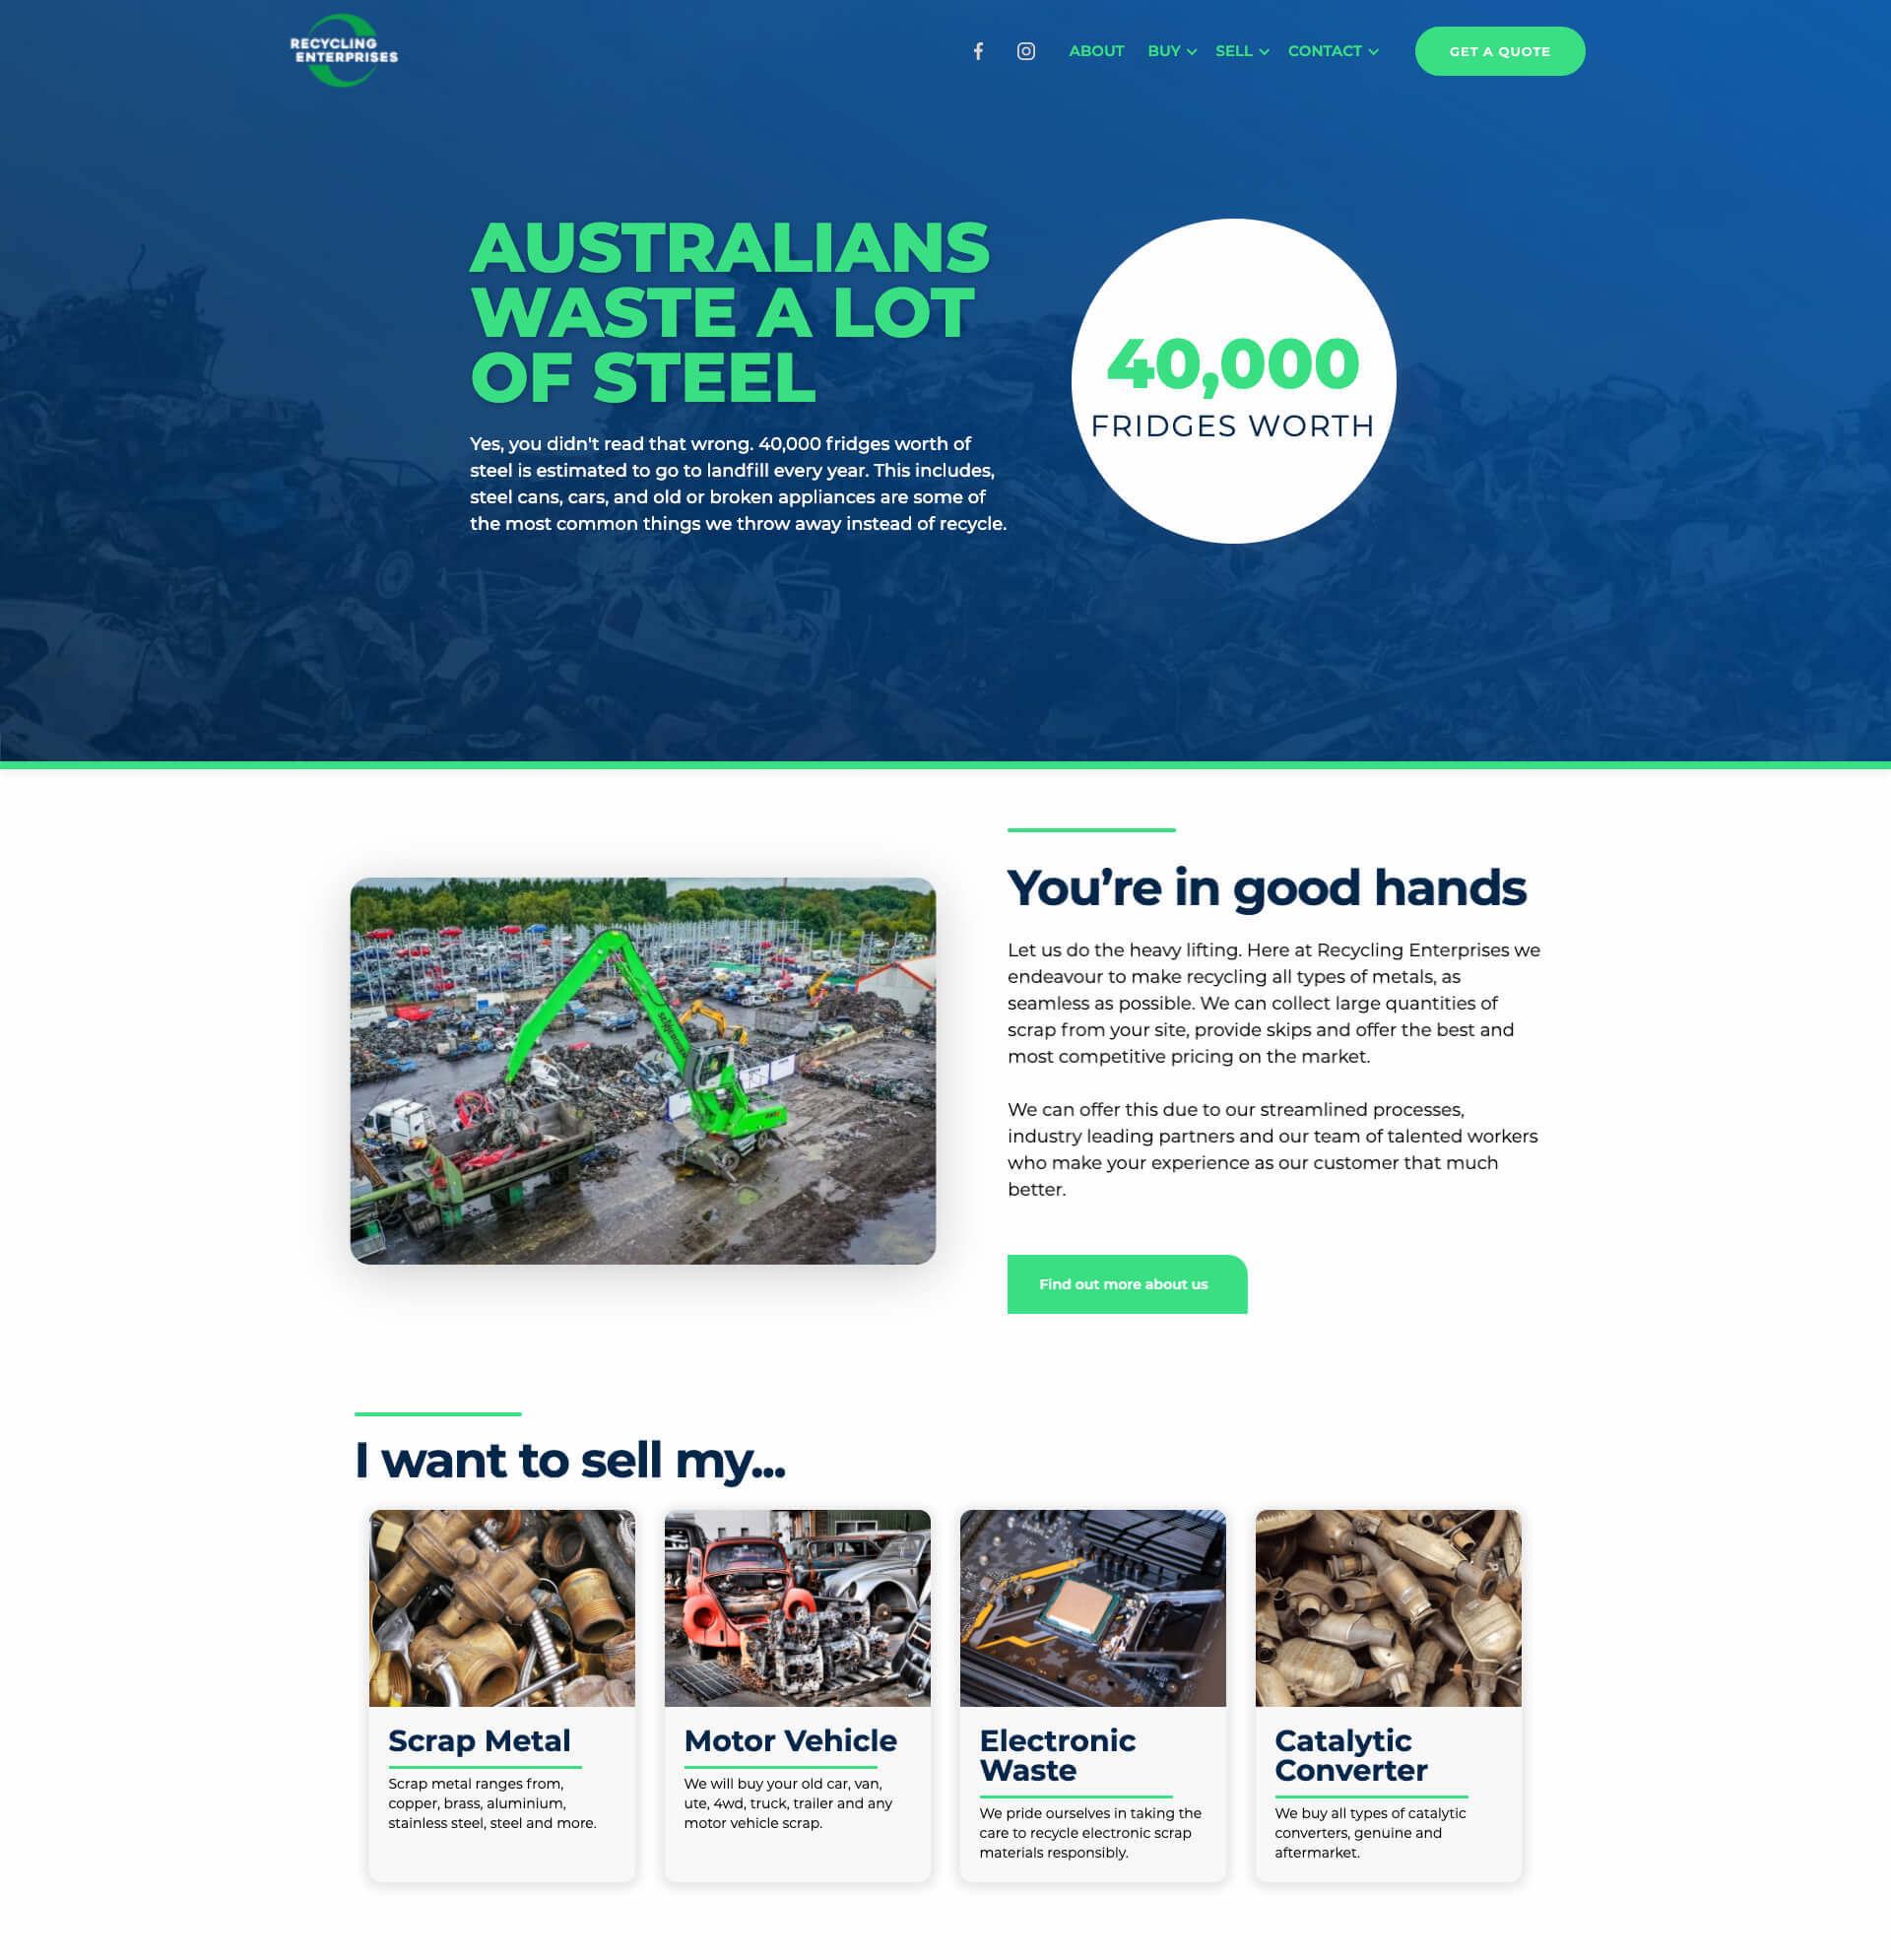 Recycling Enterprises Homepage